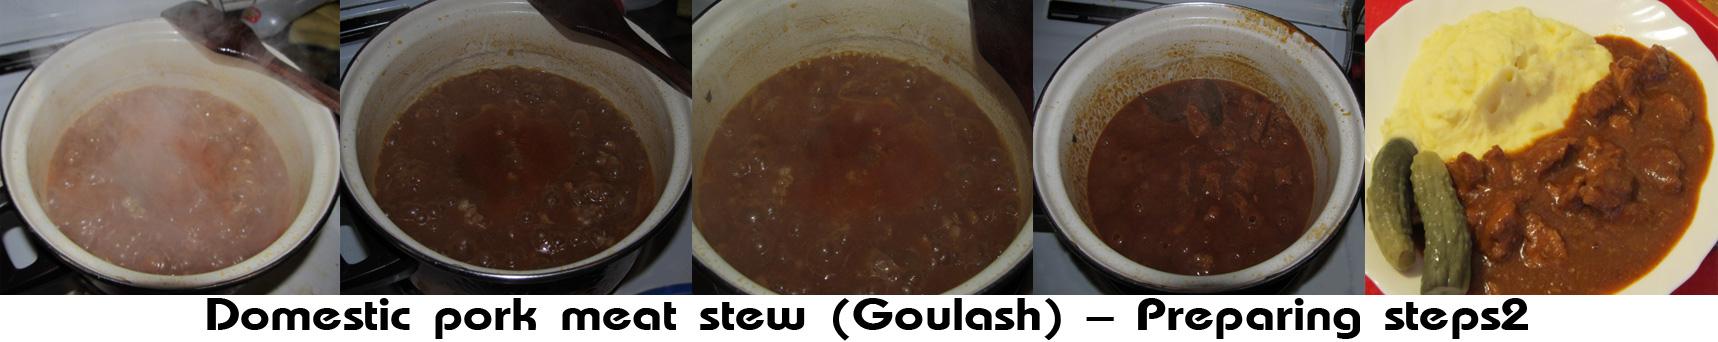 Goulash - Domestic pork meat stew preparation 2